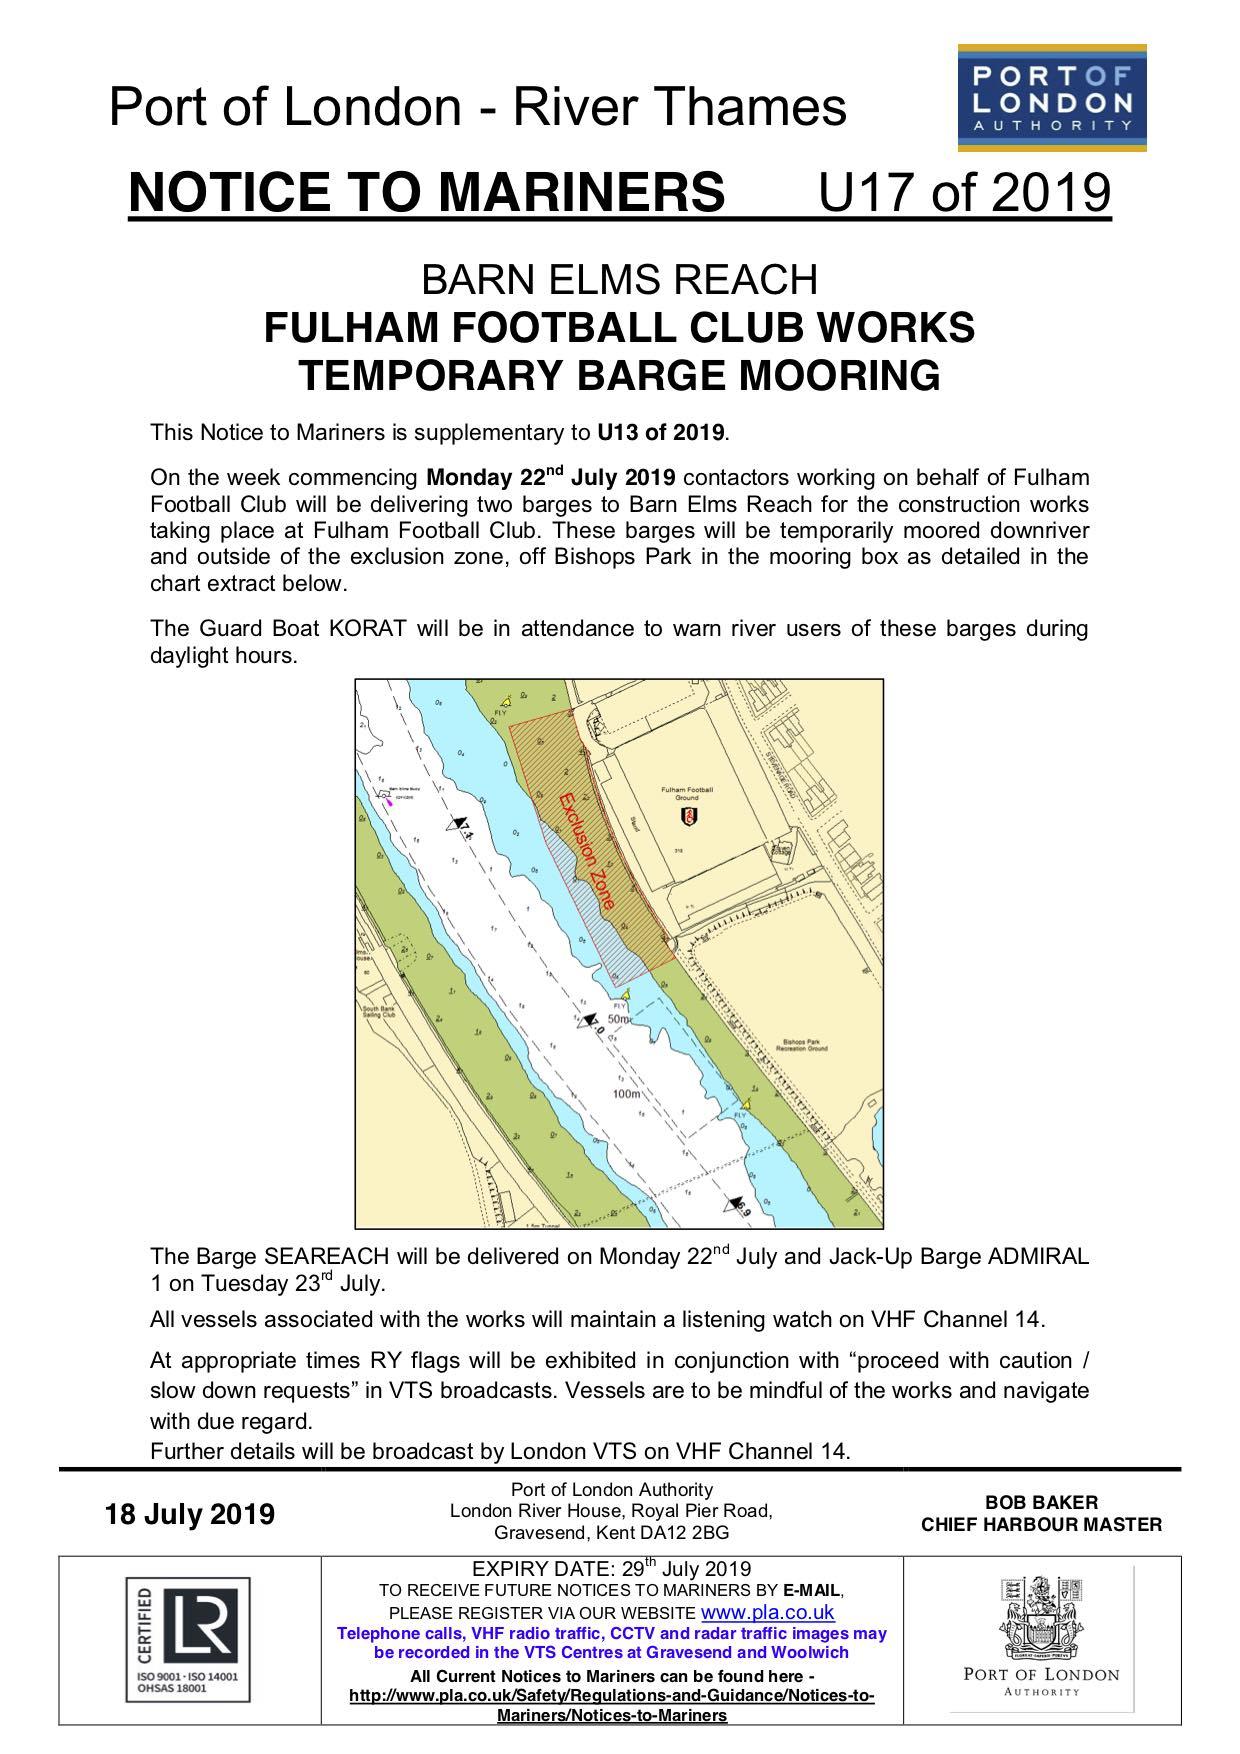 u17of2019-barnelmsreach-fulhamfootballclub-temporarybargemooring.jpg